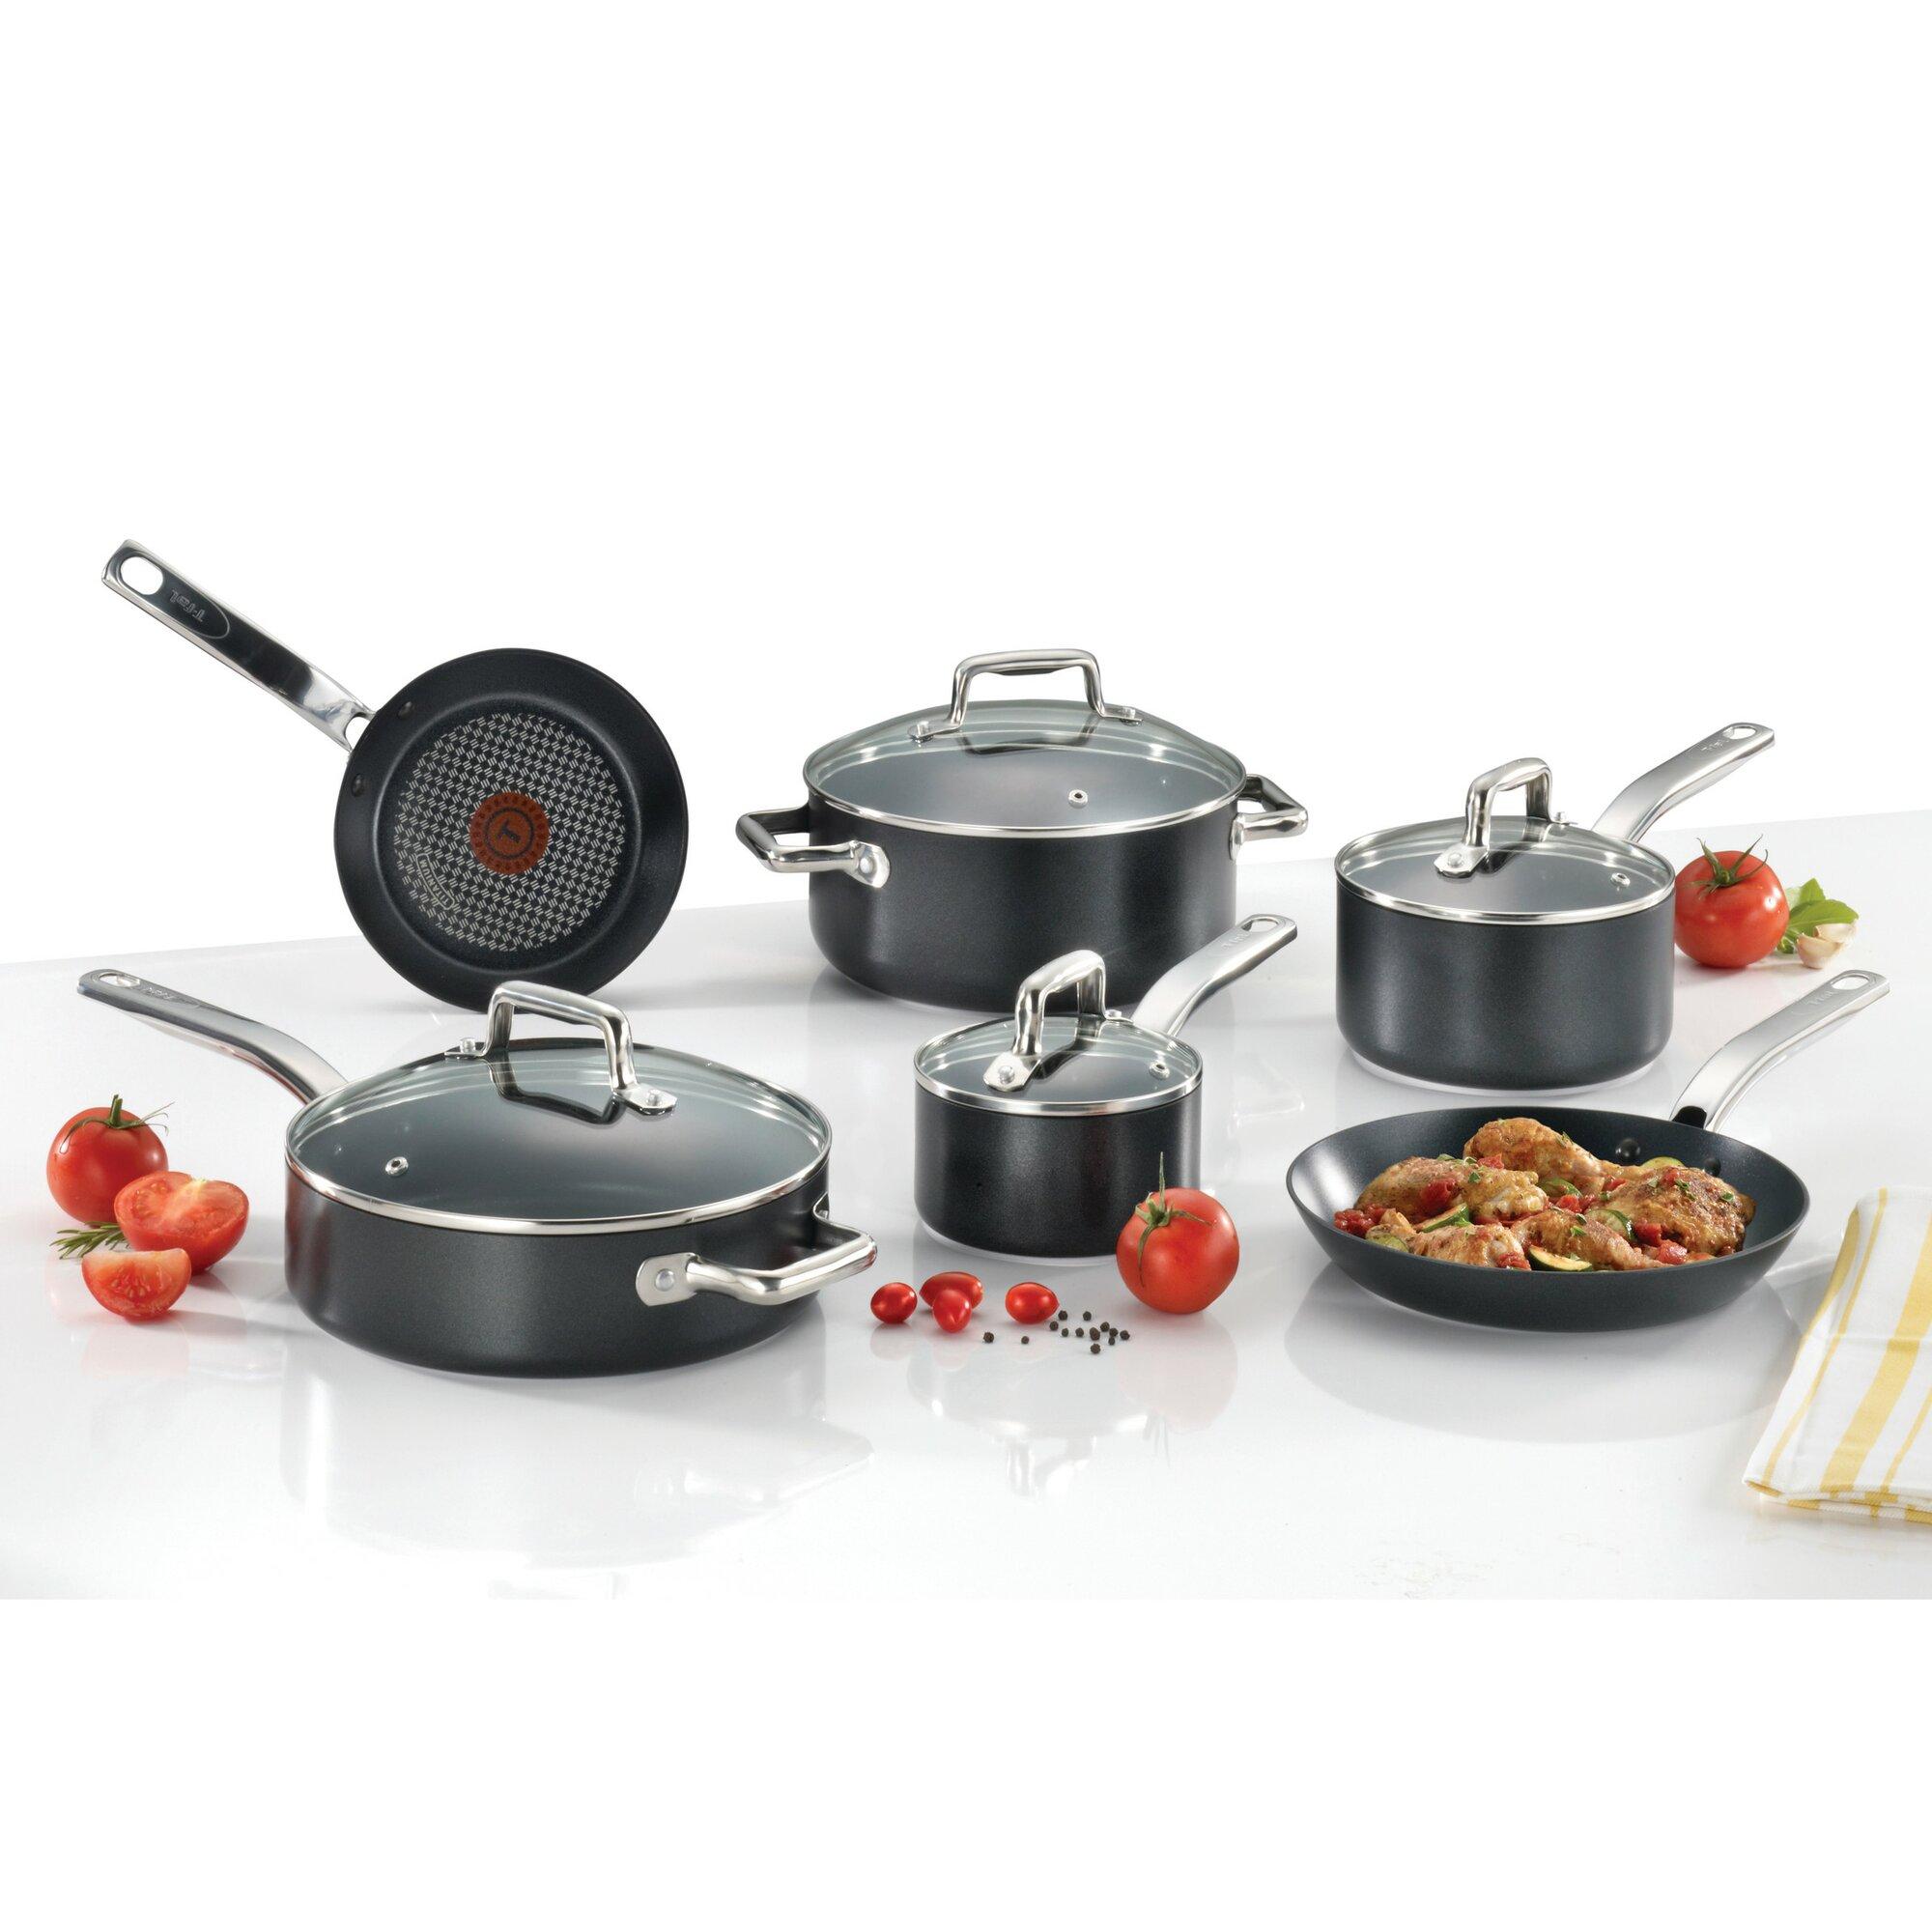 T-fal ProGrade 10-Piece Non-Stick Cookware Set & Reviews | Wayfair